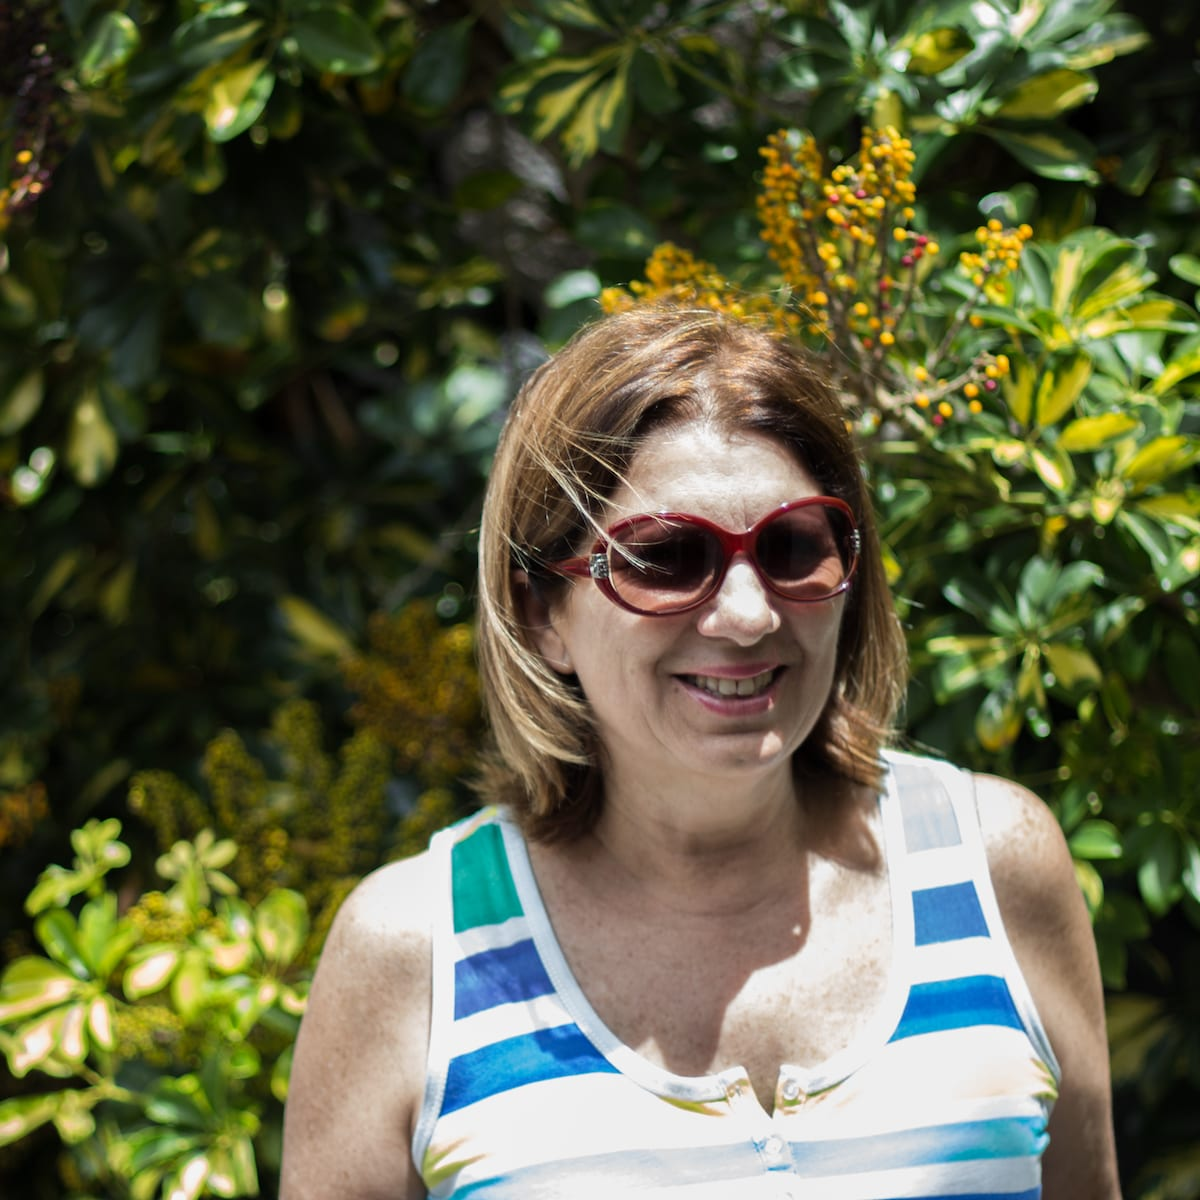 Olga from Fuencaliente